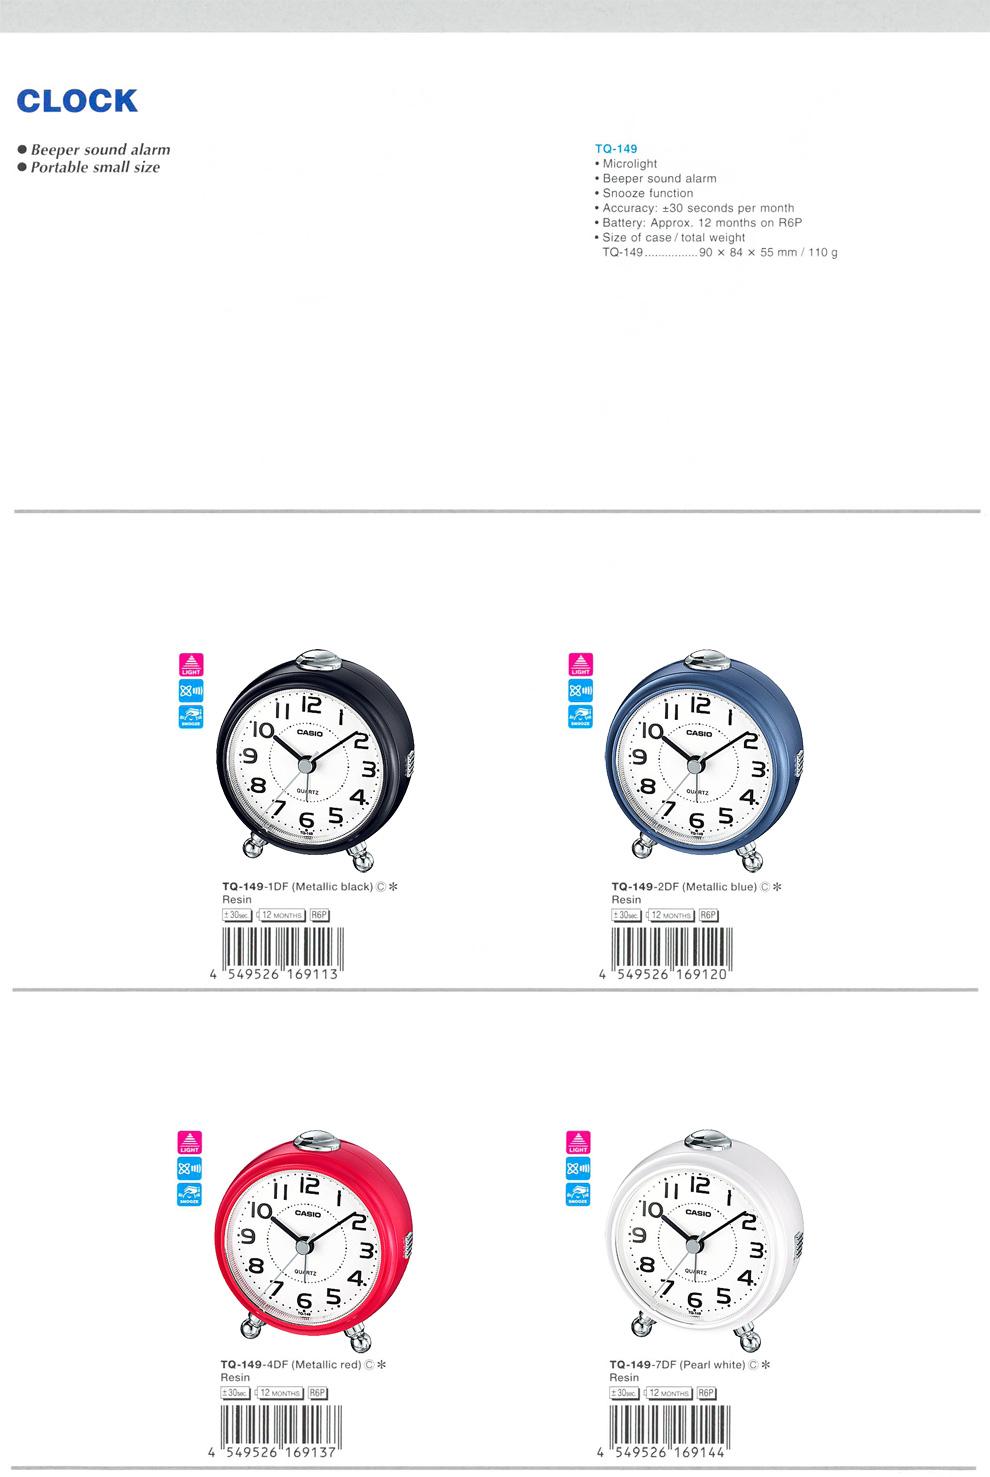 Npr Clock Tq 149 Beeper Sound Alarm Portable Small Size 1